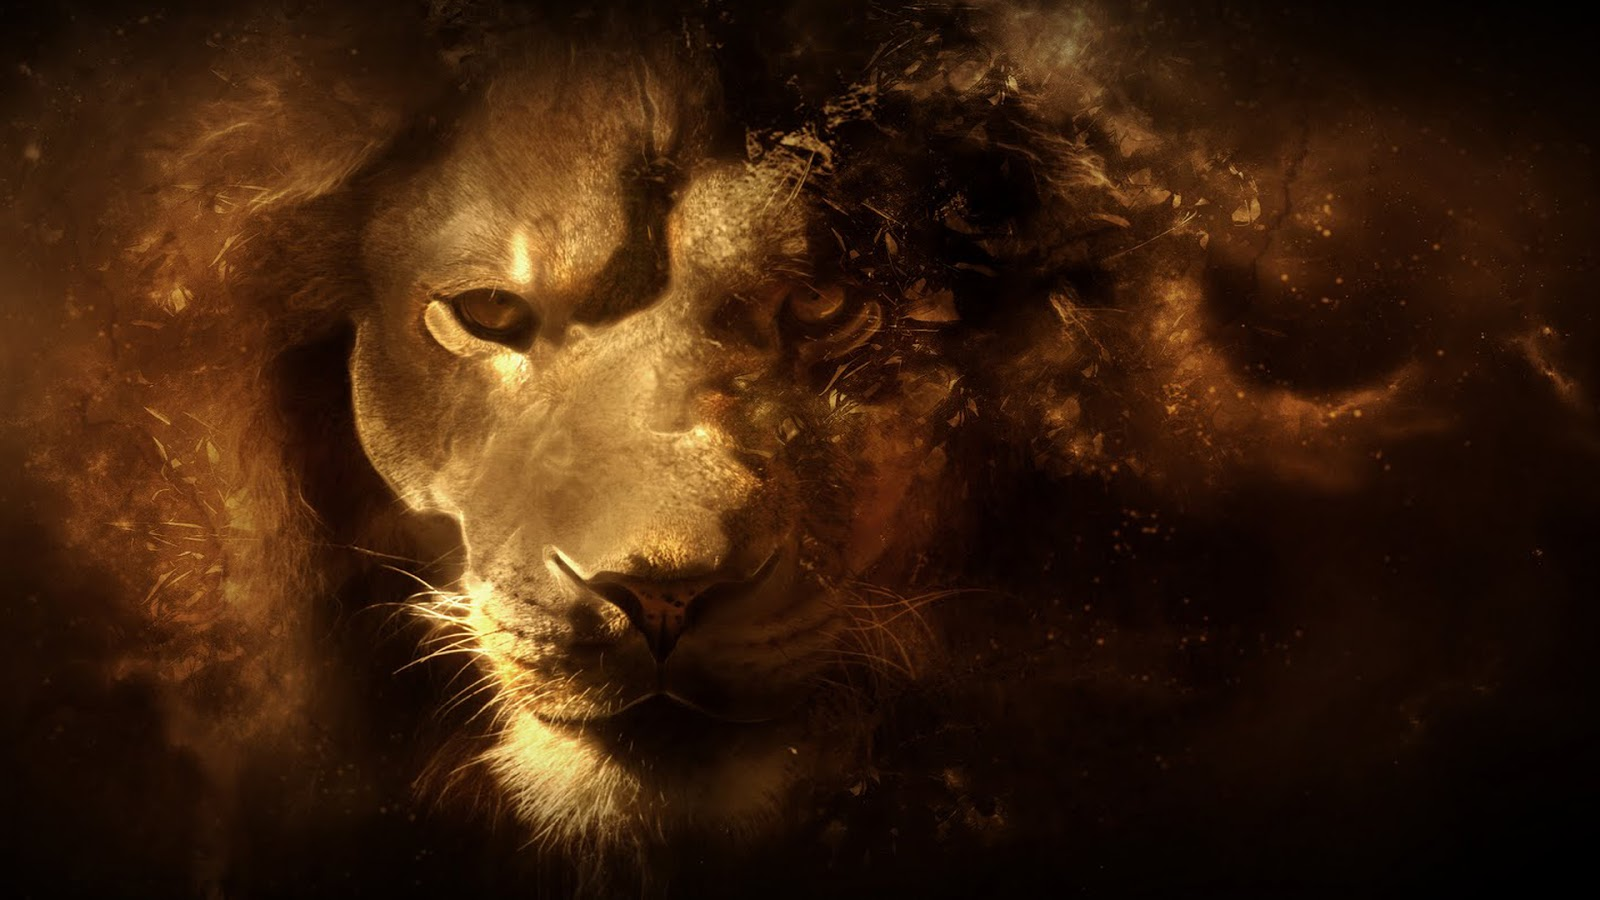 Lion Vector Art 1080p HD Wallpaper Latest HD Wallpapers 1600x900